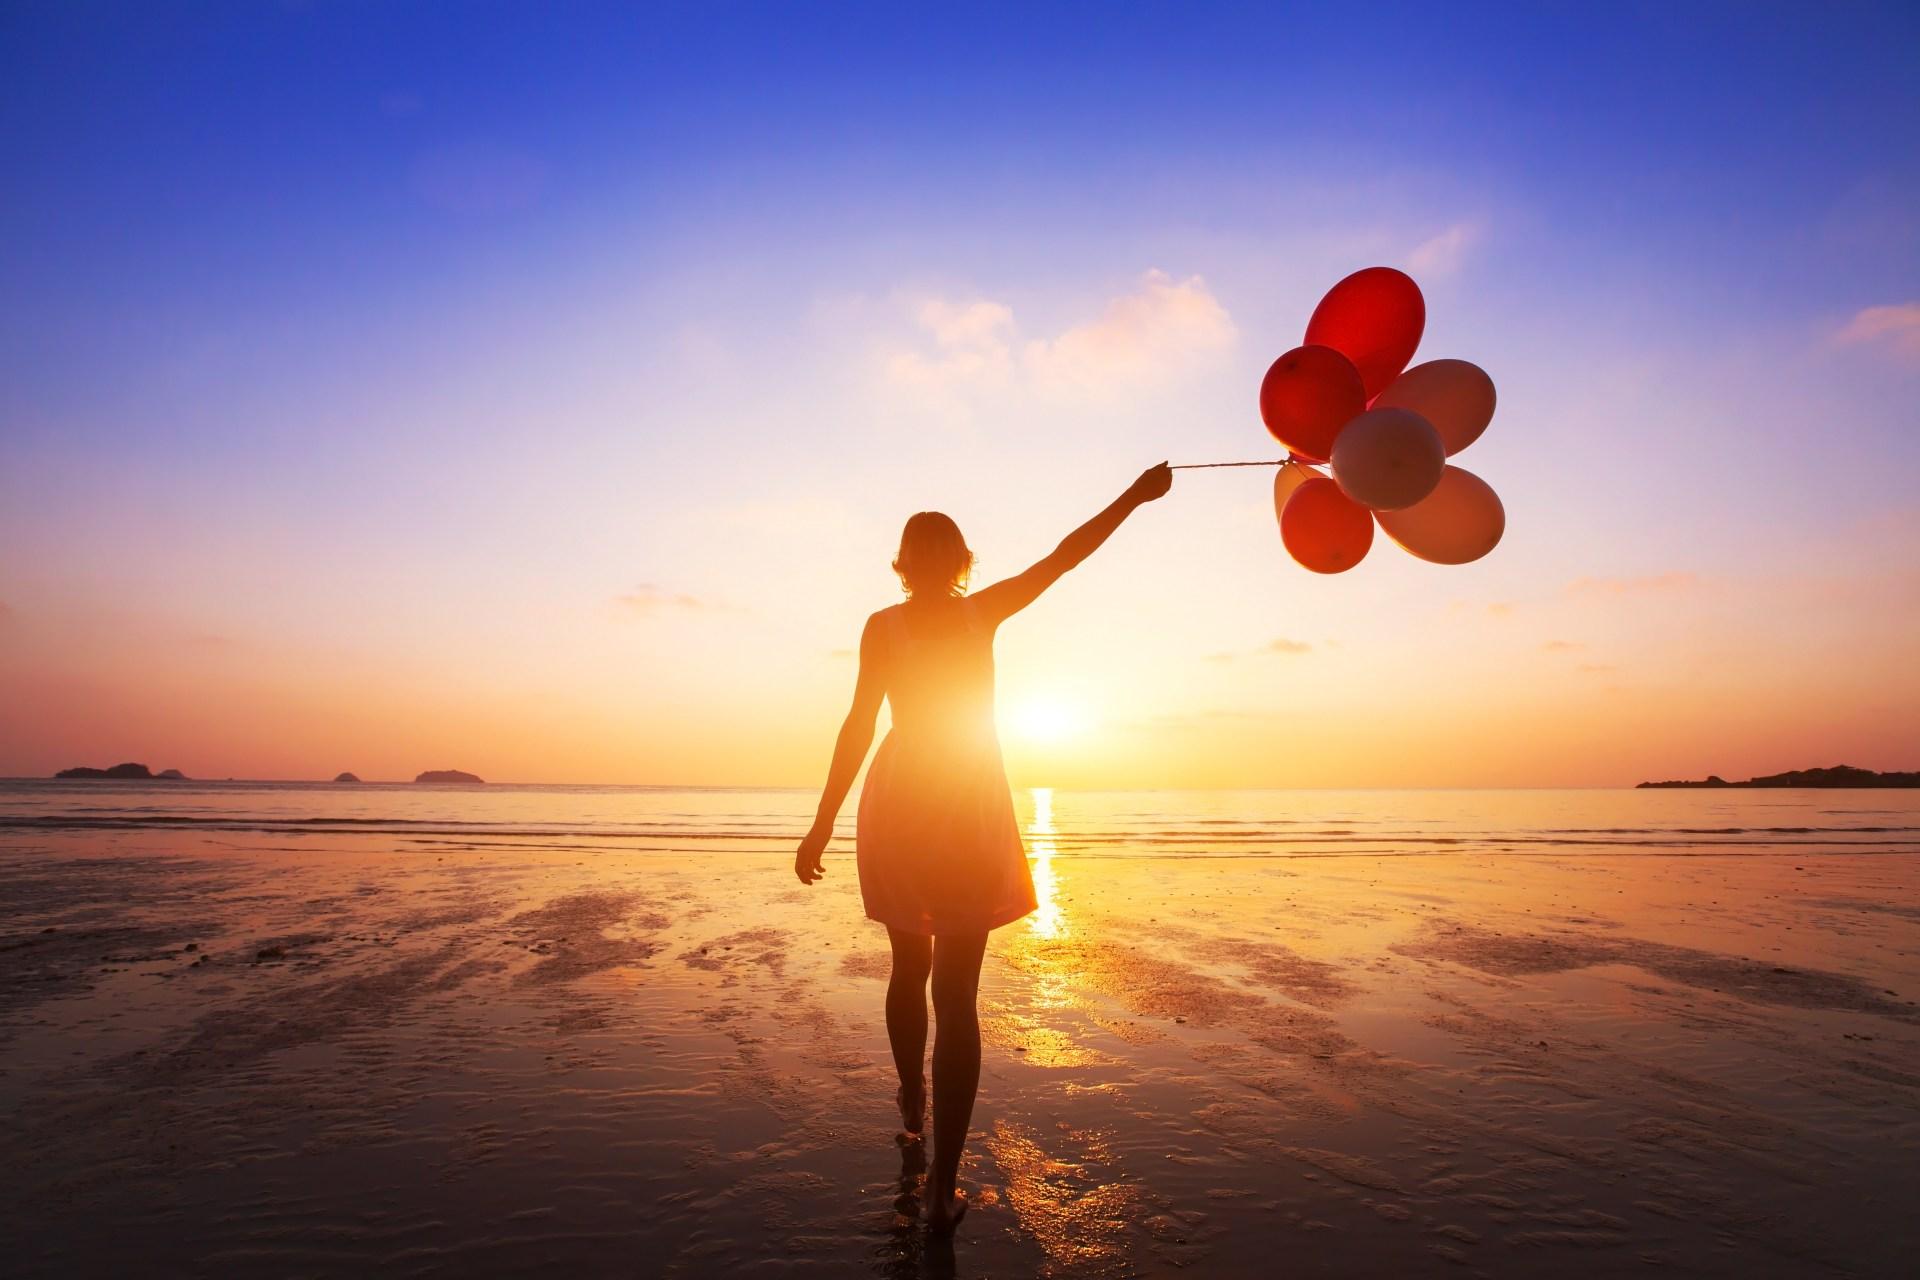 Sreća - Doznajte sretne dane ožujka na osnovu Vašeg horoskopa!